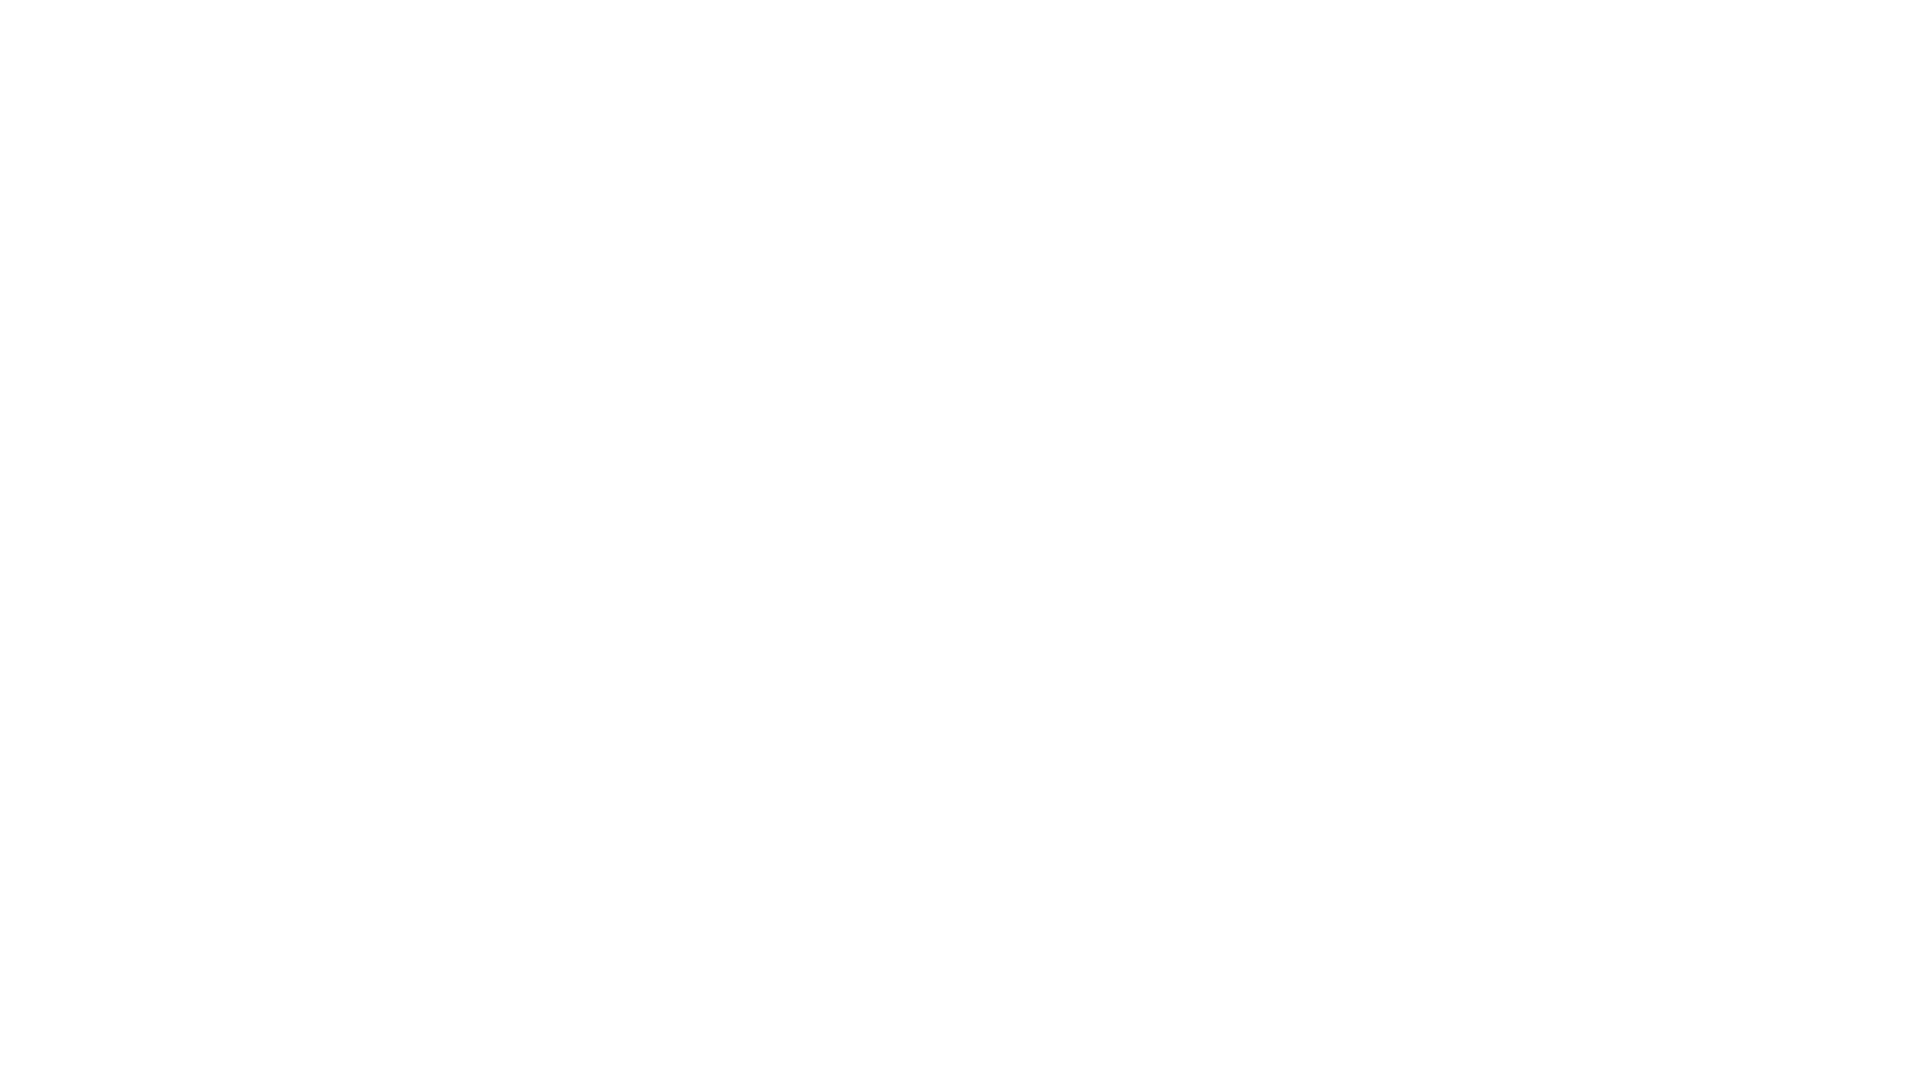 Mist Visual - Studio Animacji. Czwarta ilustracja do animacji NASK Rejestr PL